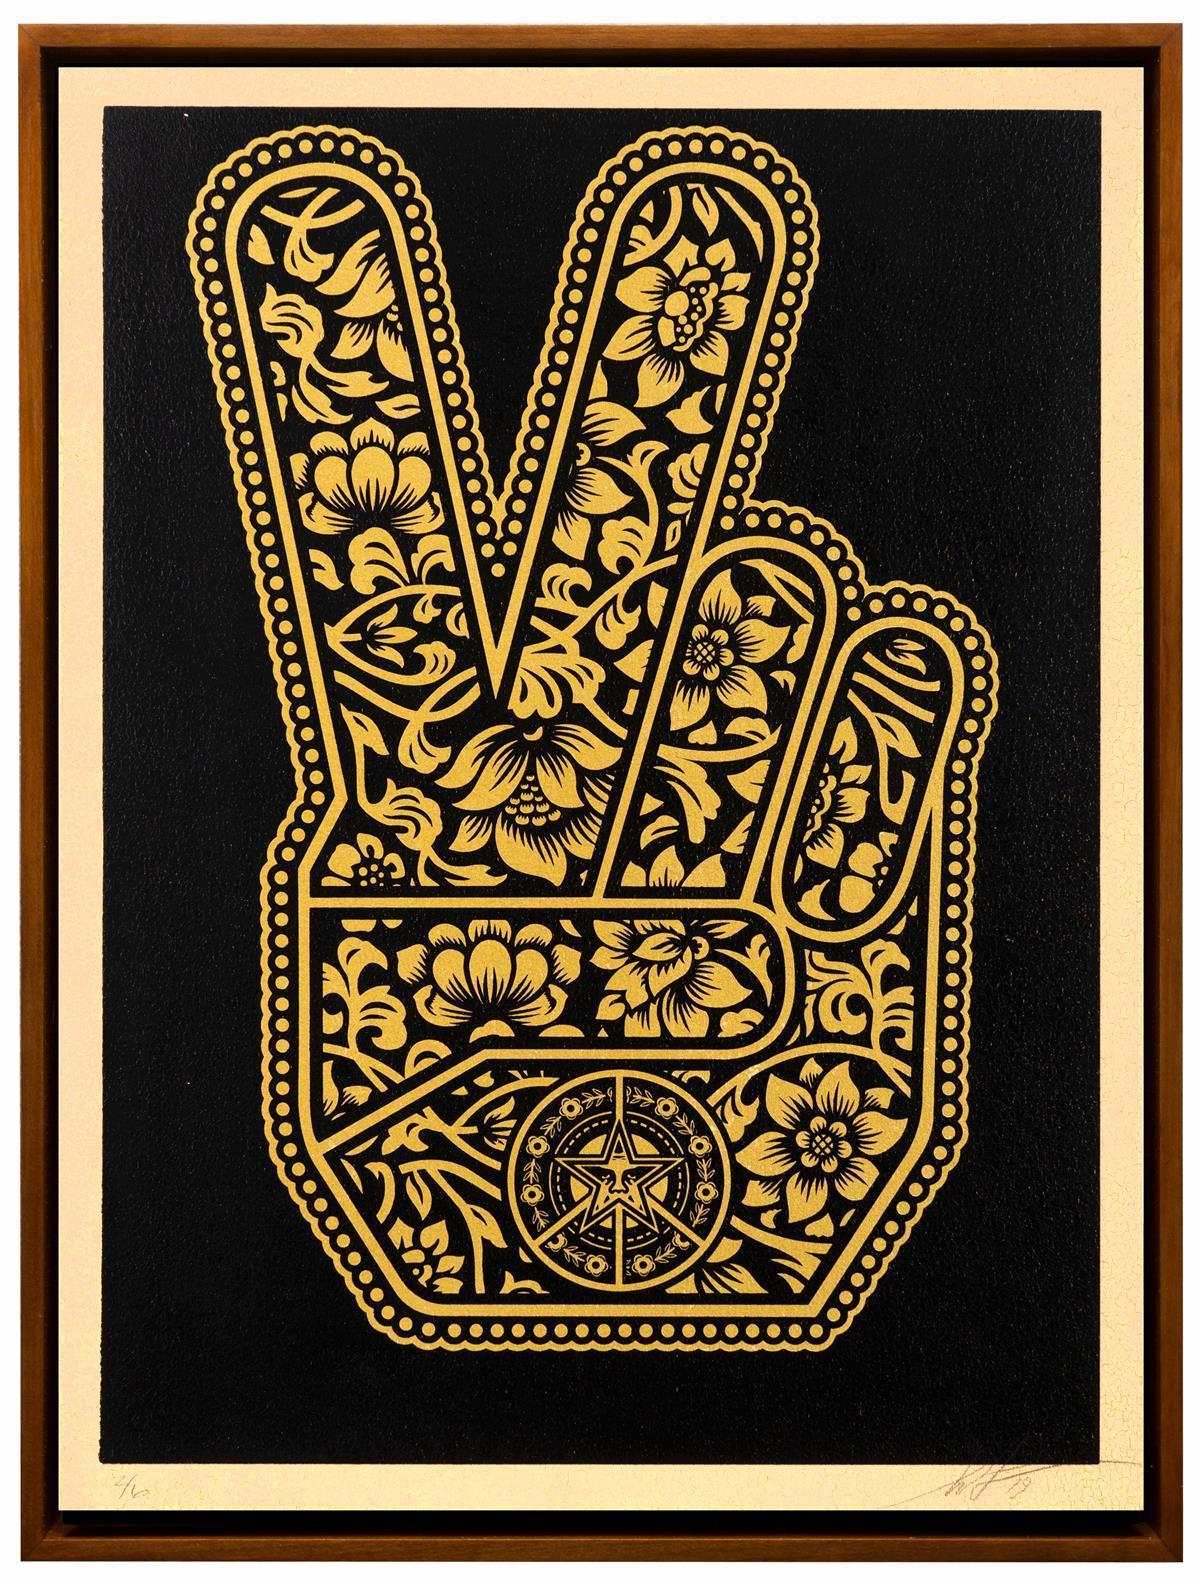 "Shepard Fairey, (b. 1970, American), ""End Gun Violence Together Peace Fingers,"" 2019, Silkscreen on Wood Panel, 24"" H x 18"" W"